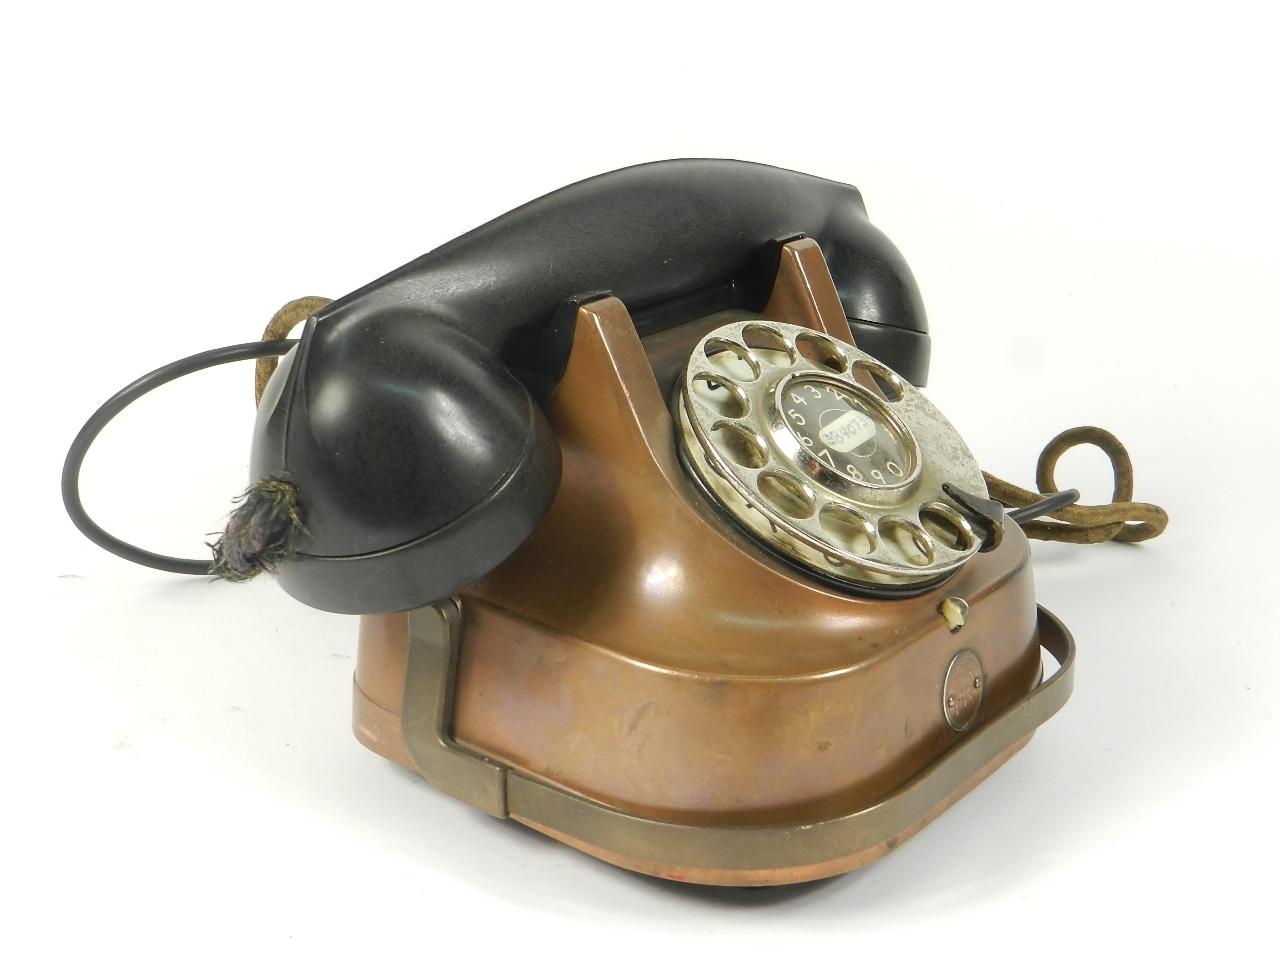 Imagen TELEFONO SOBREMESA COBRE AÑO 1940 35351